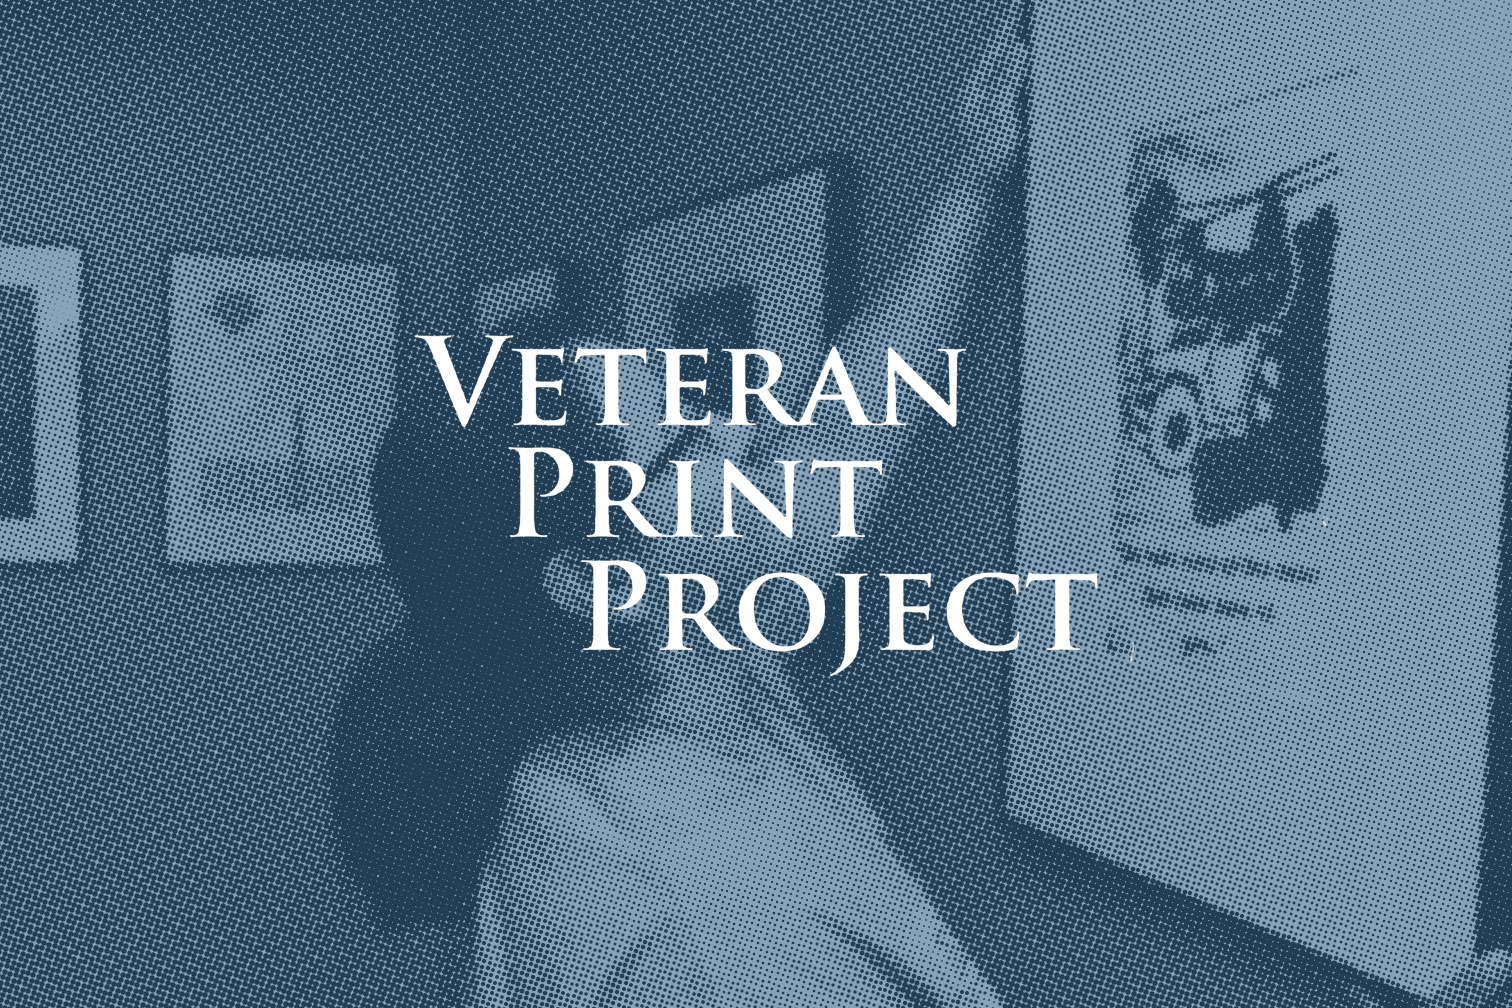 Veteran Print Project